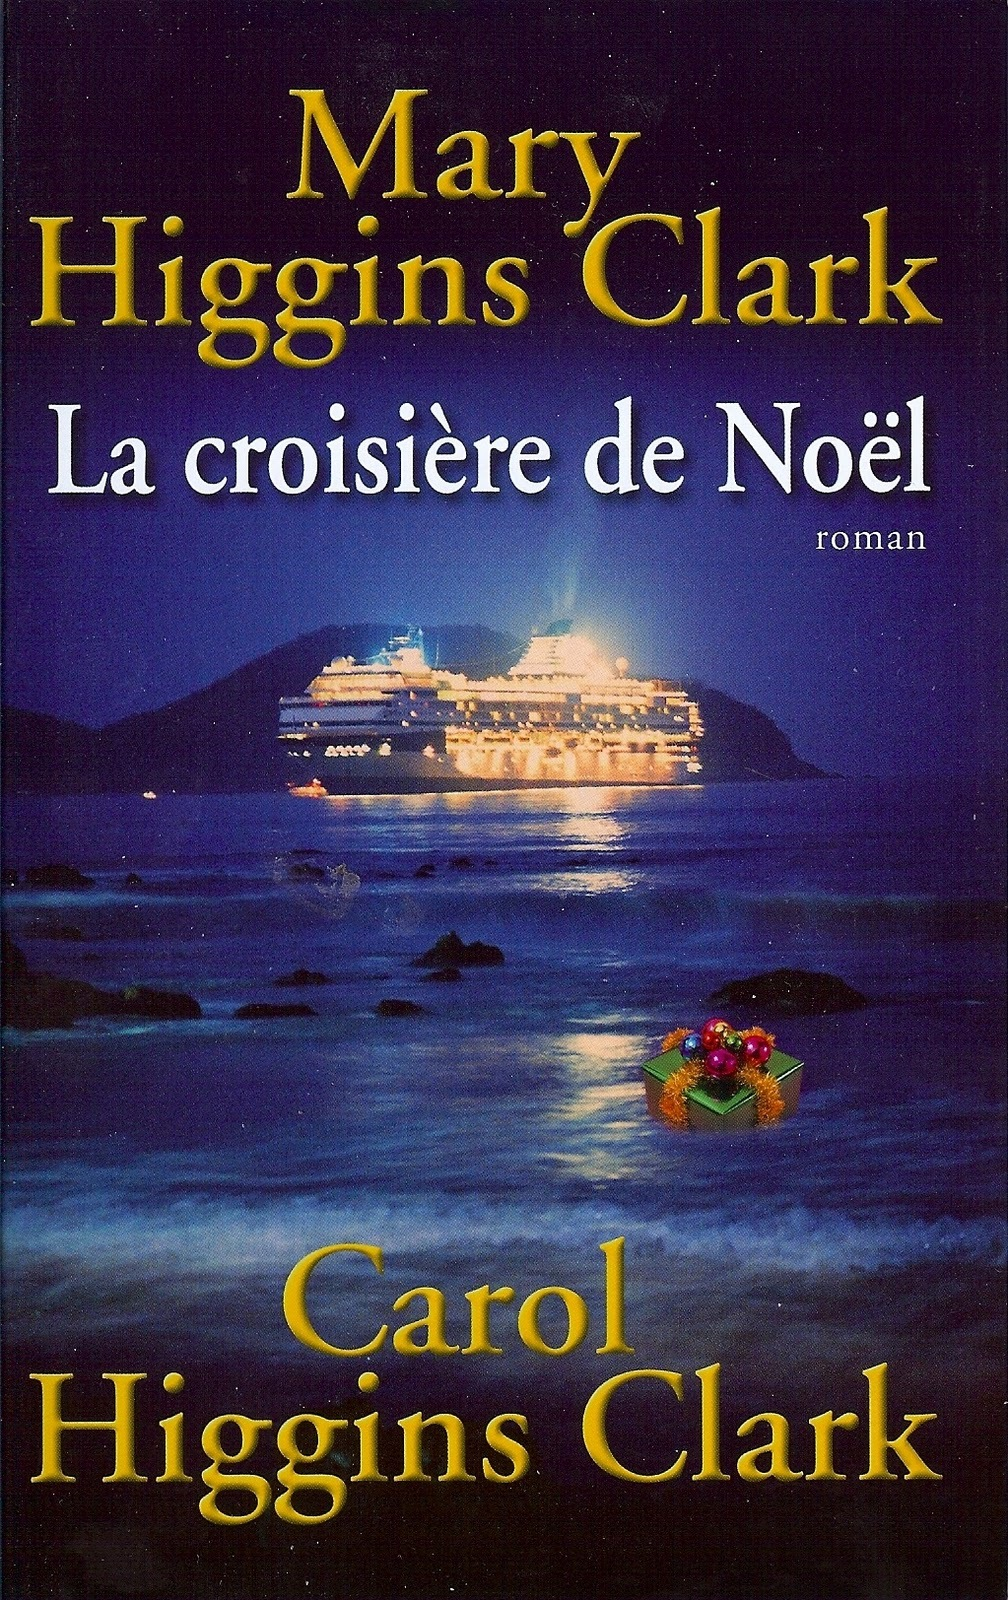 cdn1.booknode.com/book_cover/552/full/la-croisiere-de-noel-551655.jpg